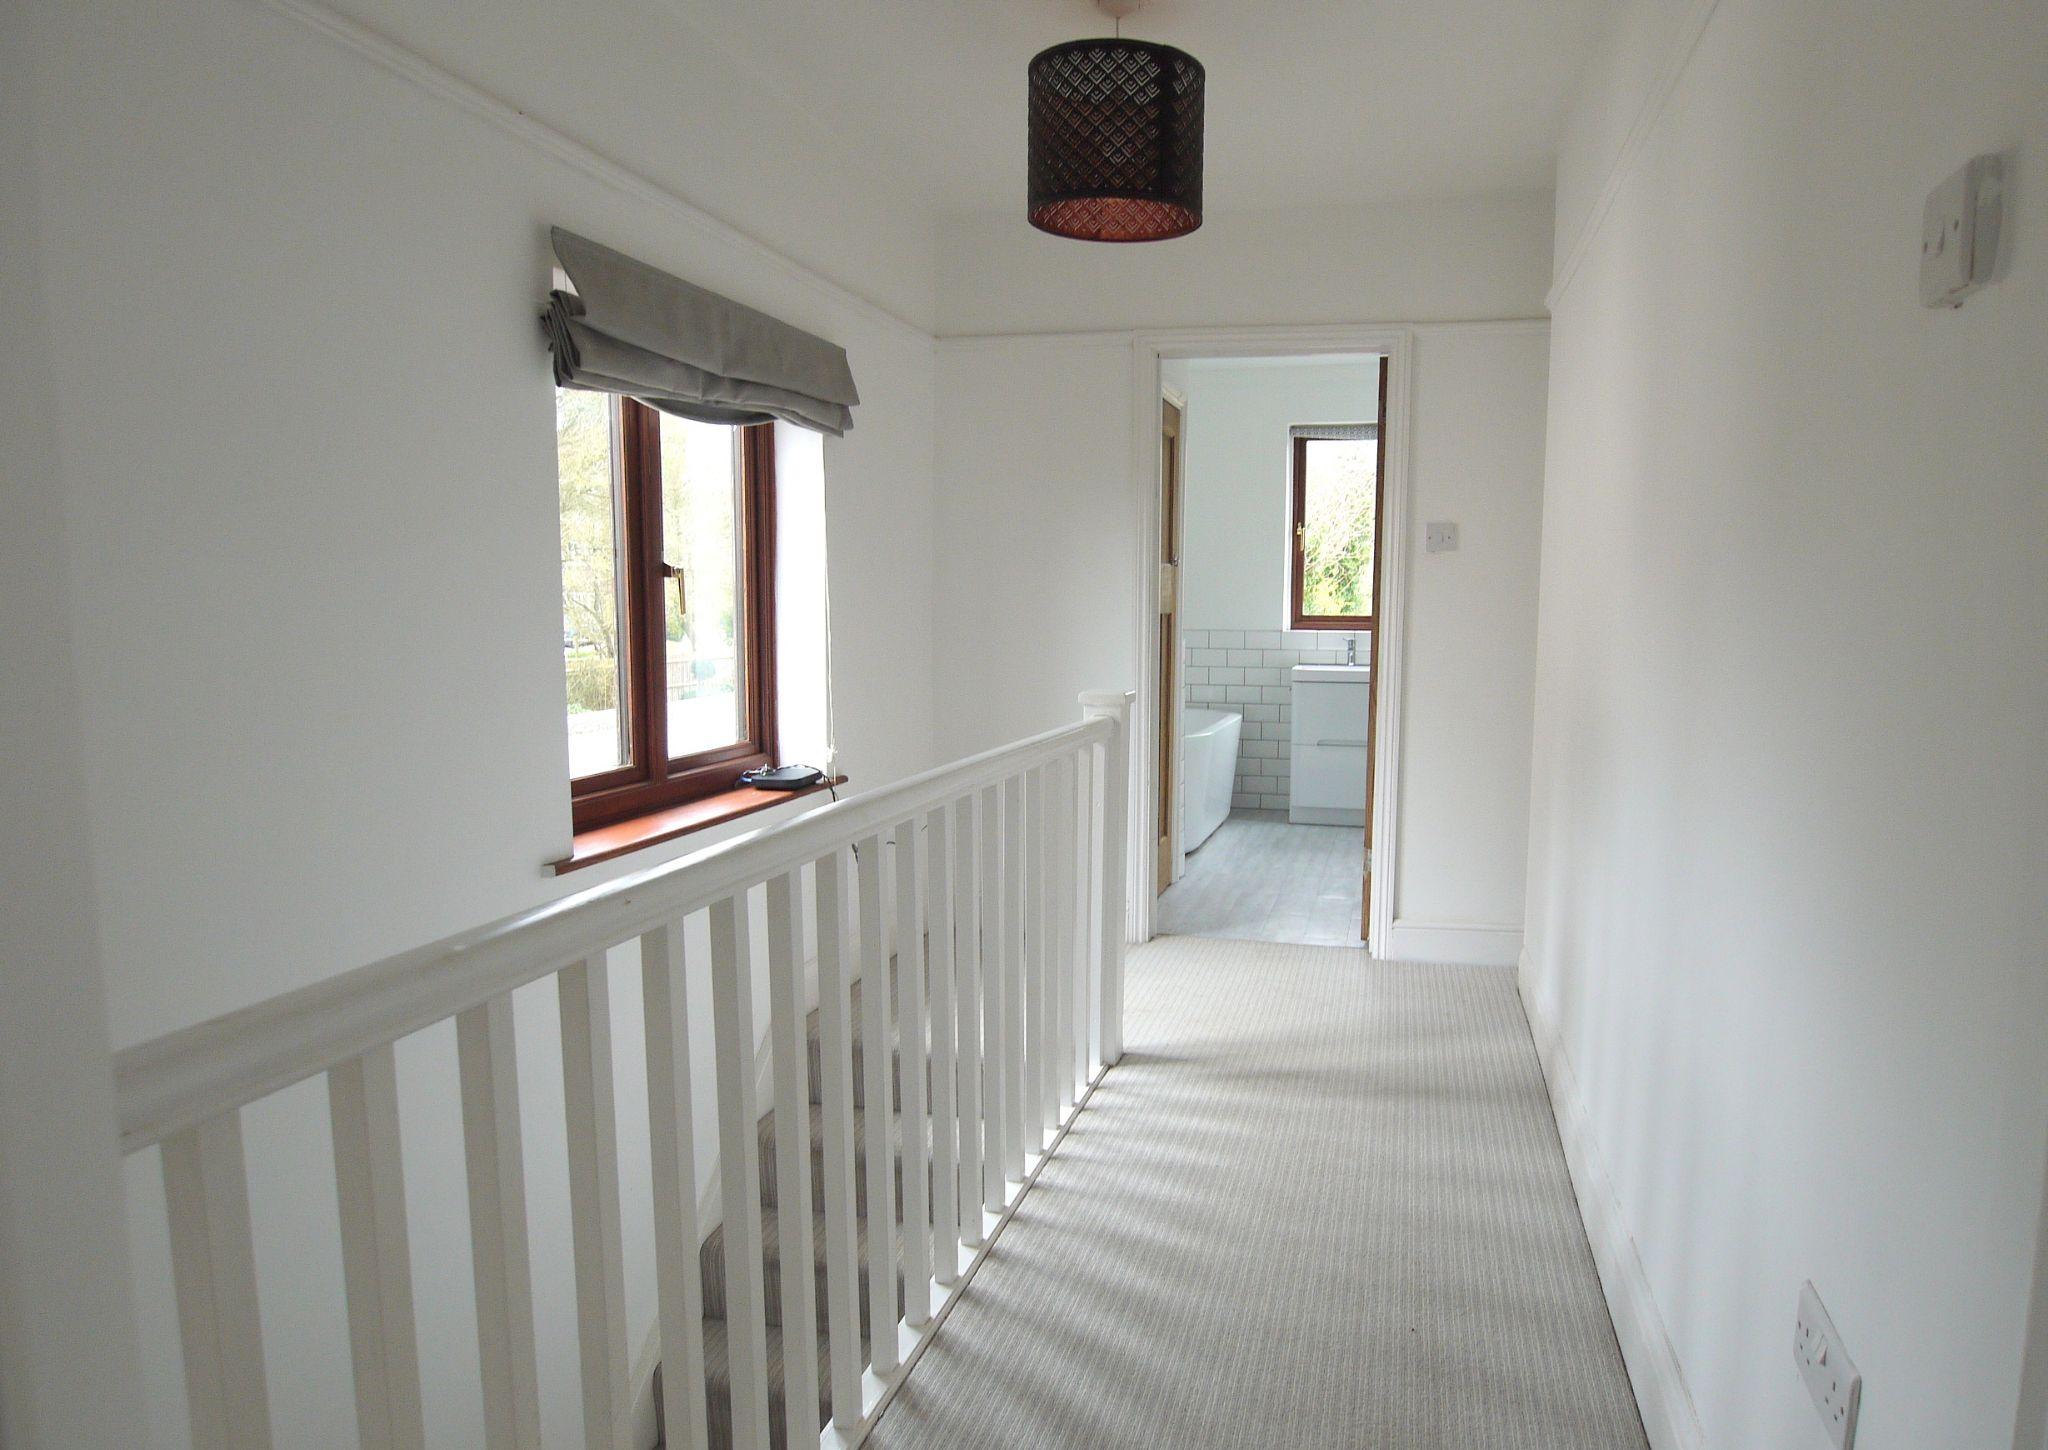 3 bedroom semi-detached house Sold in Sevenoaks - Photograph 7